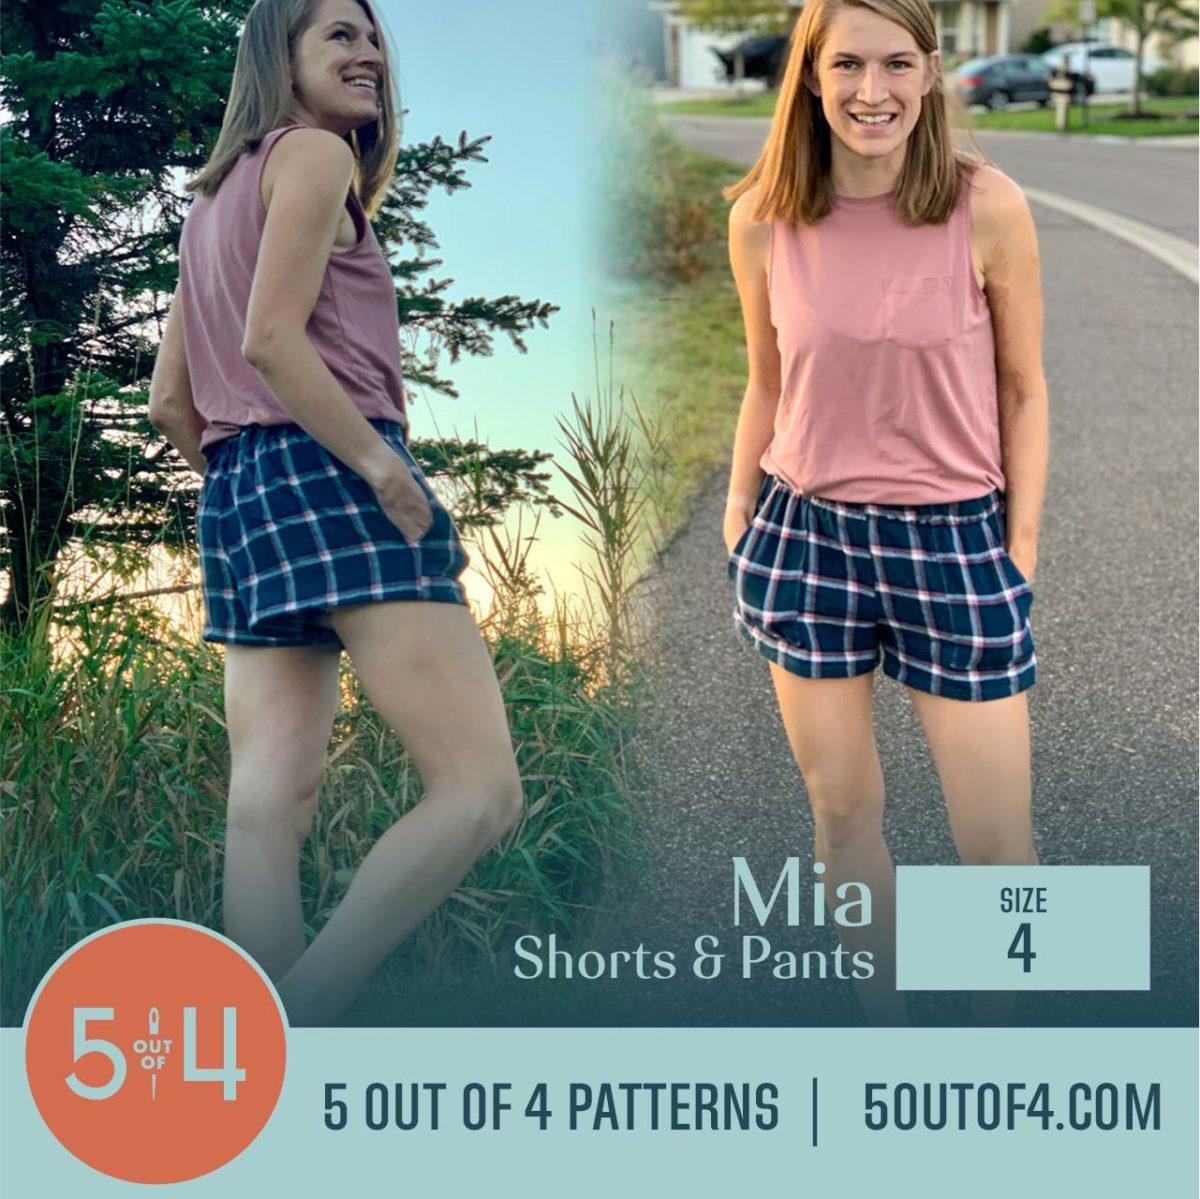 5oo4 Patterns Mia Pants size 4